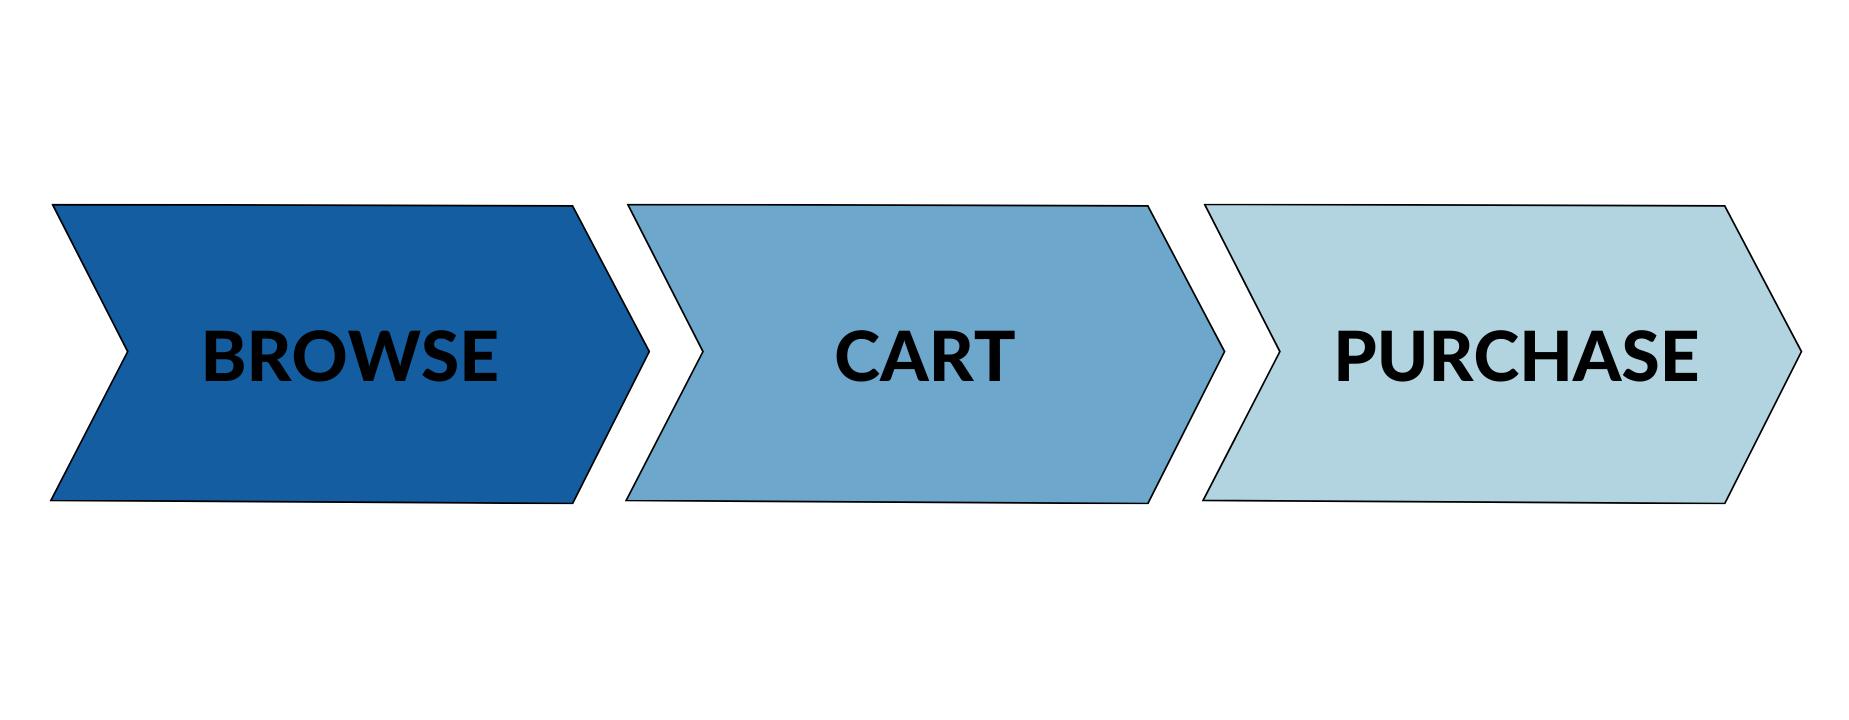 Illustration of ecommerce conversion funnel